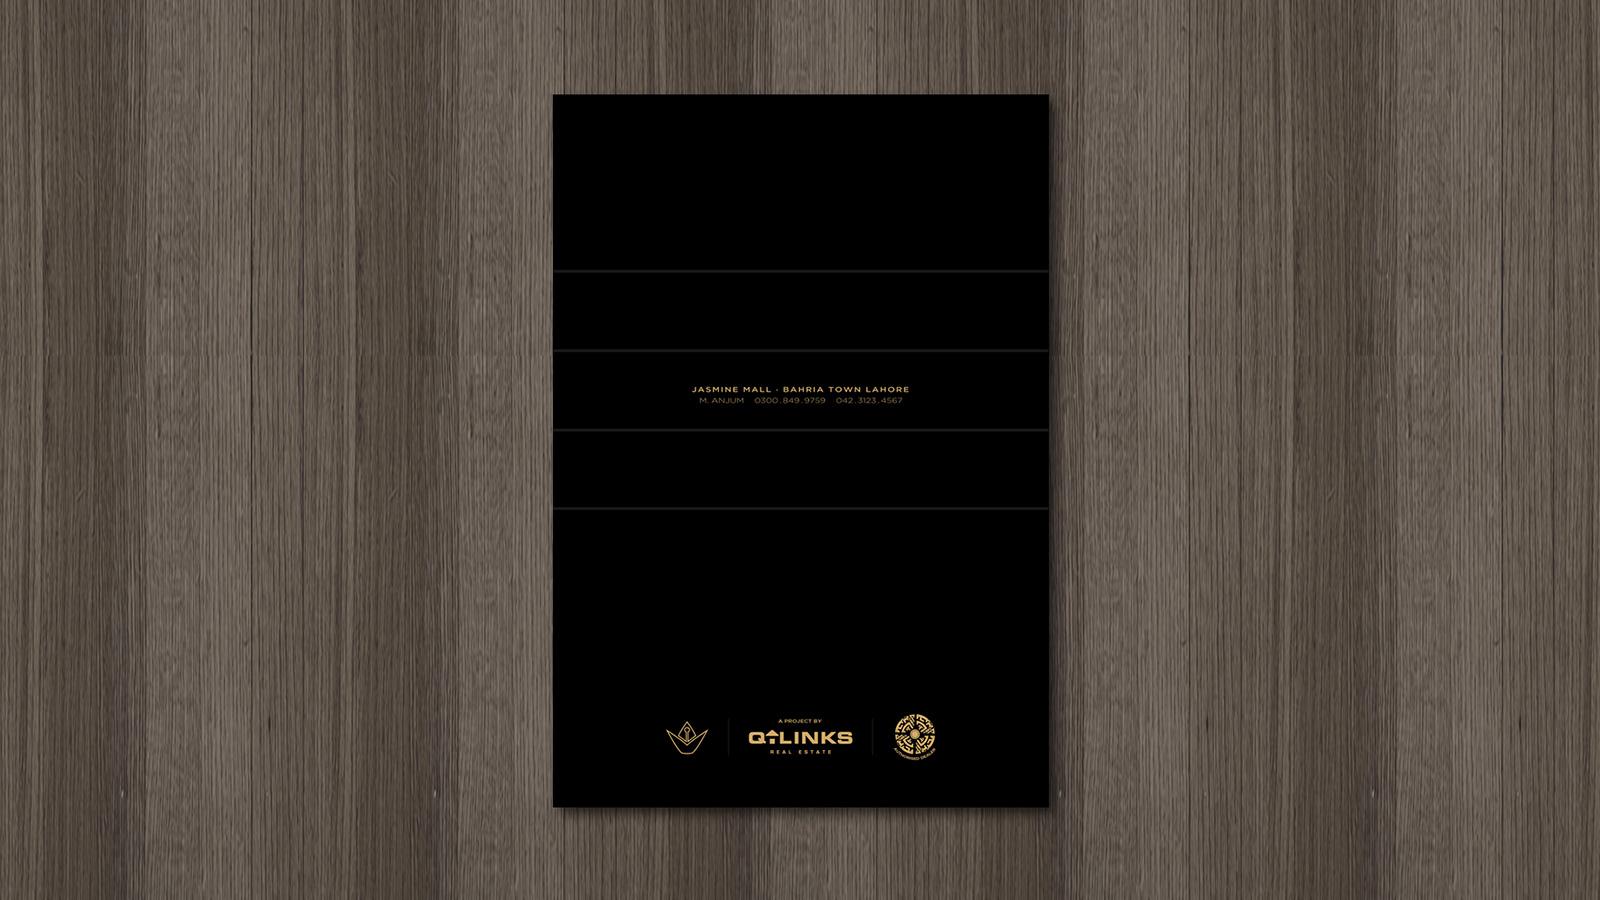 graphic-brand-design-web-designer-hiline-lahore-pakistan-jasmine-mall-008